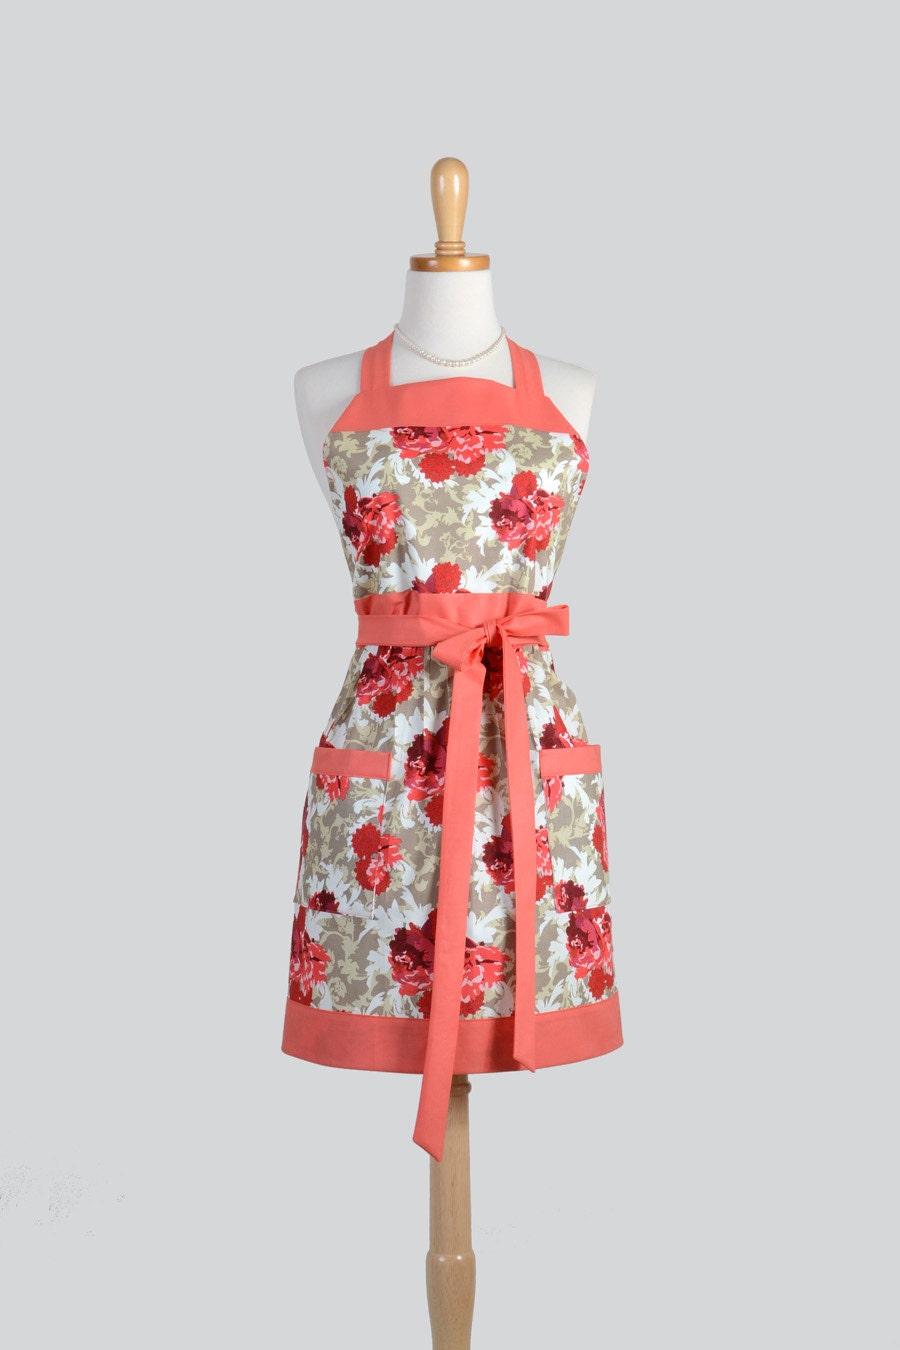 full bib womens apron vintage aprons style verona coral and. Black Bedroom Furniture Sets. Home Design Ideas